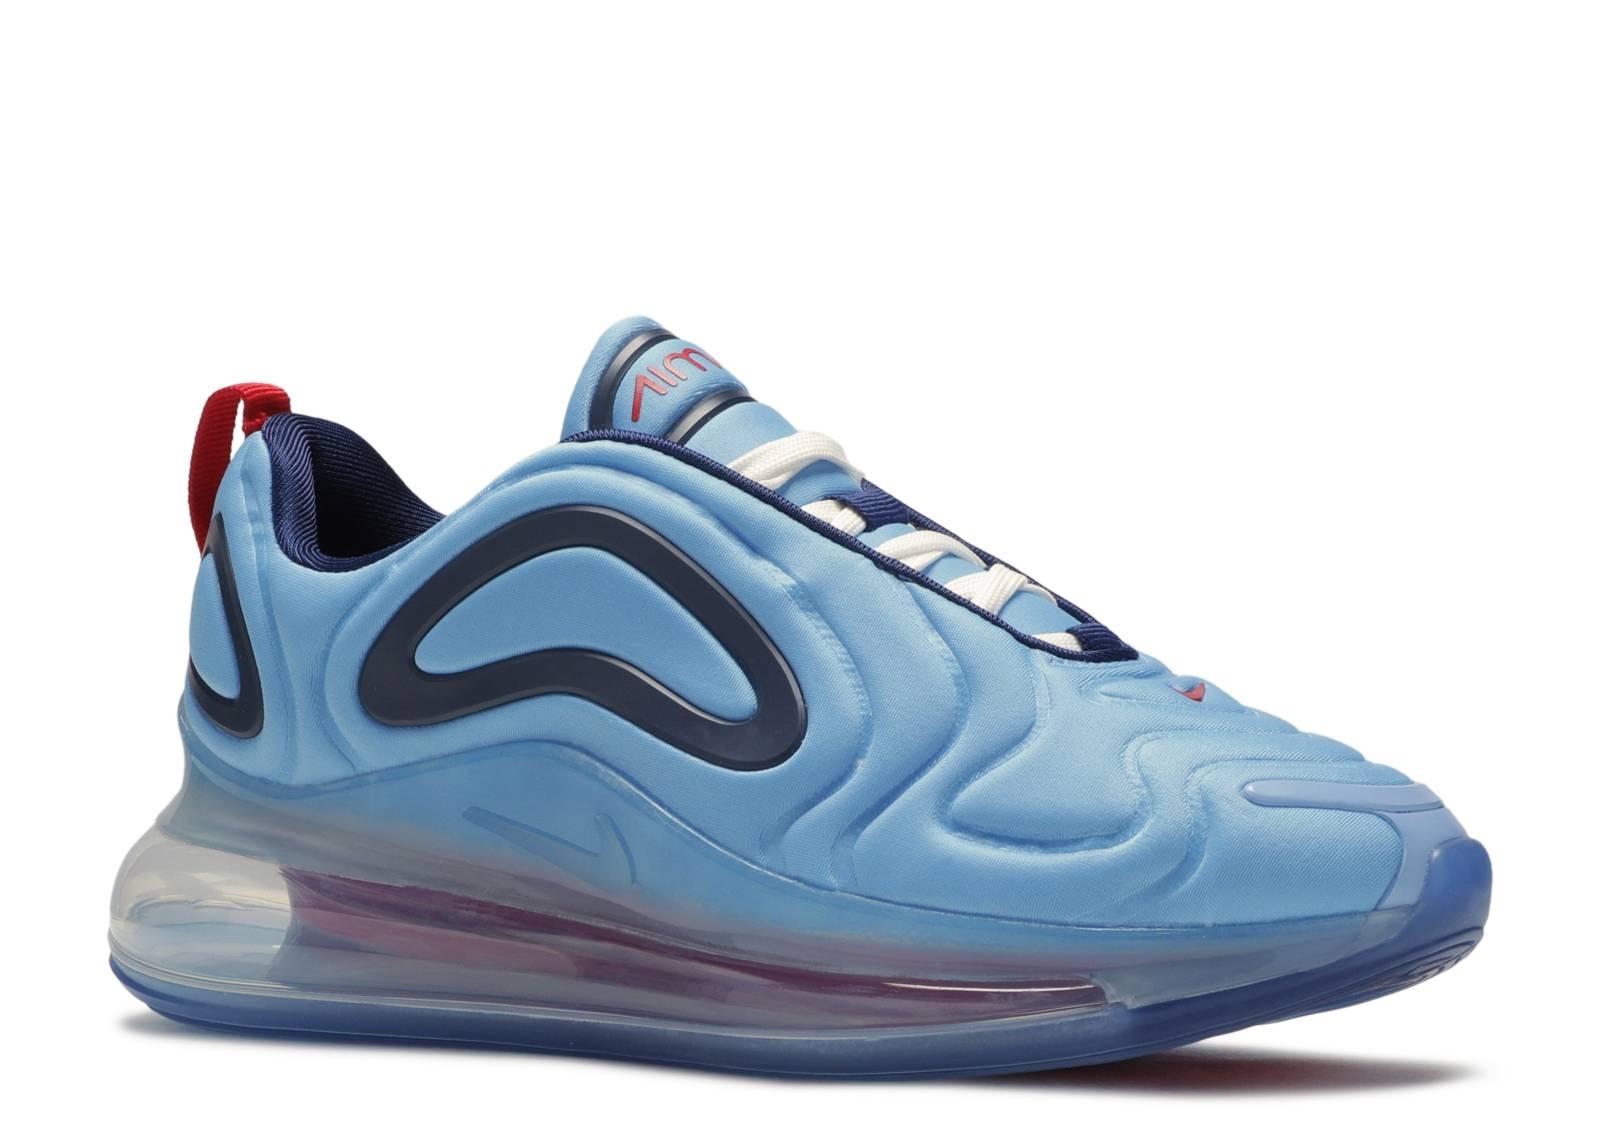 Wmns Air Max 720 'University Blue'